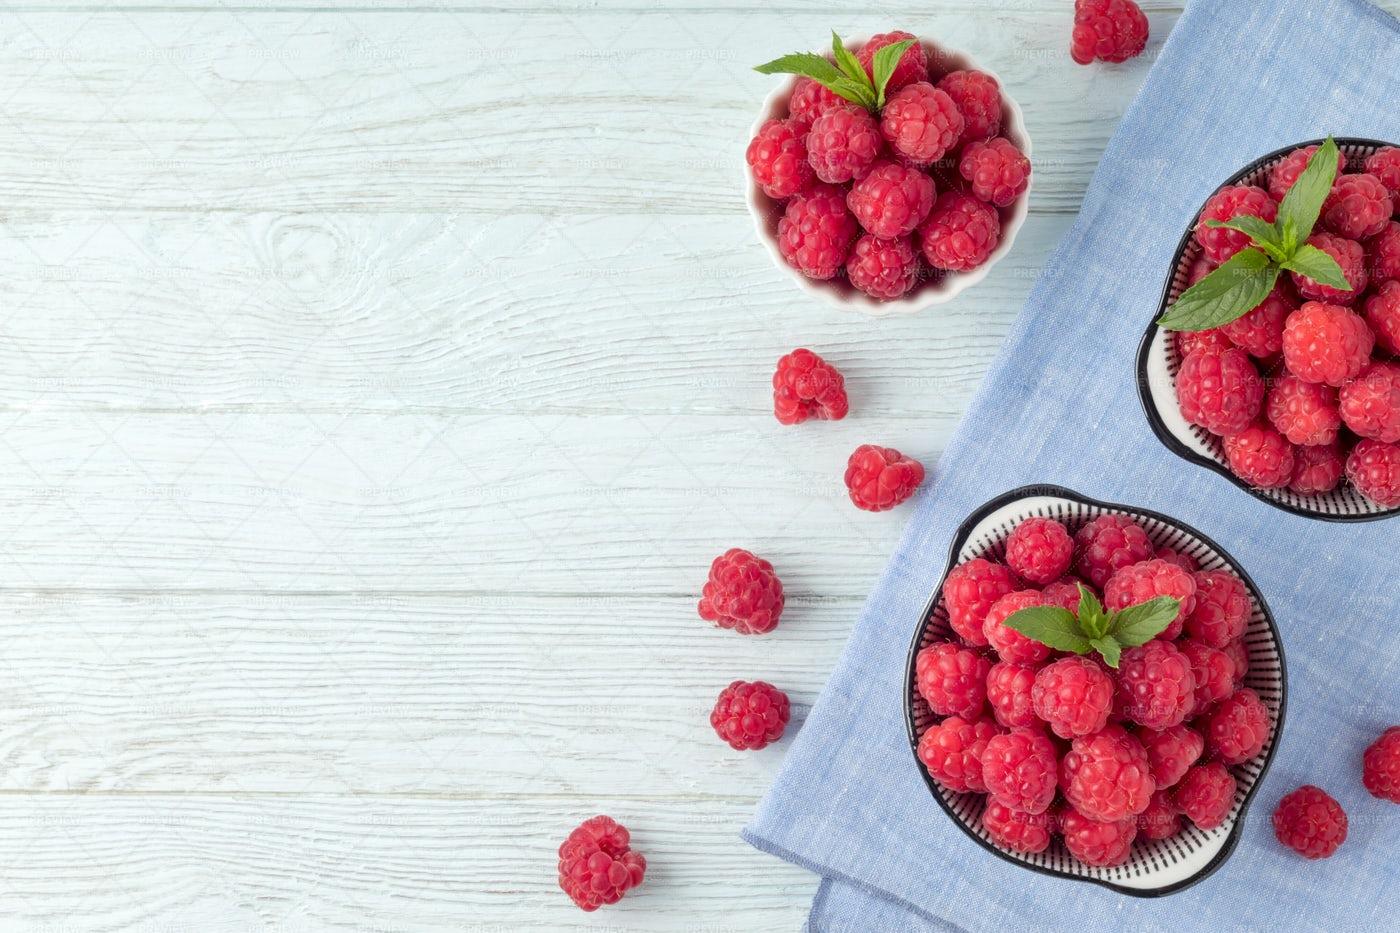 Raspberries Bowls: Stock Photos